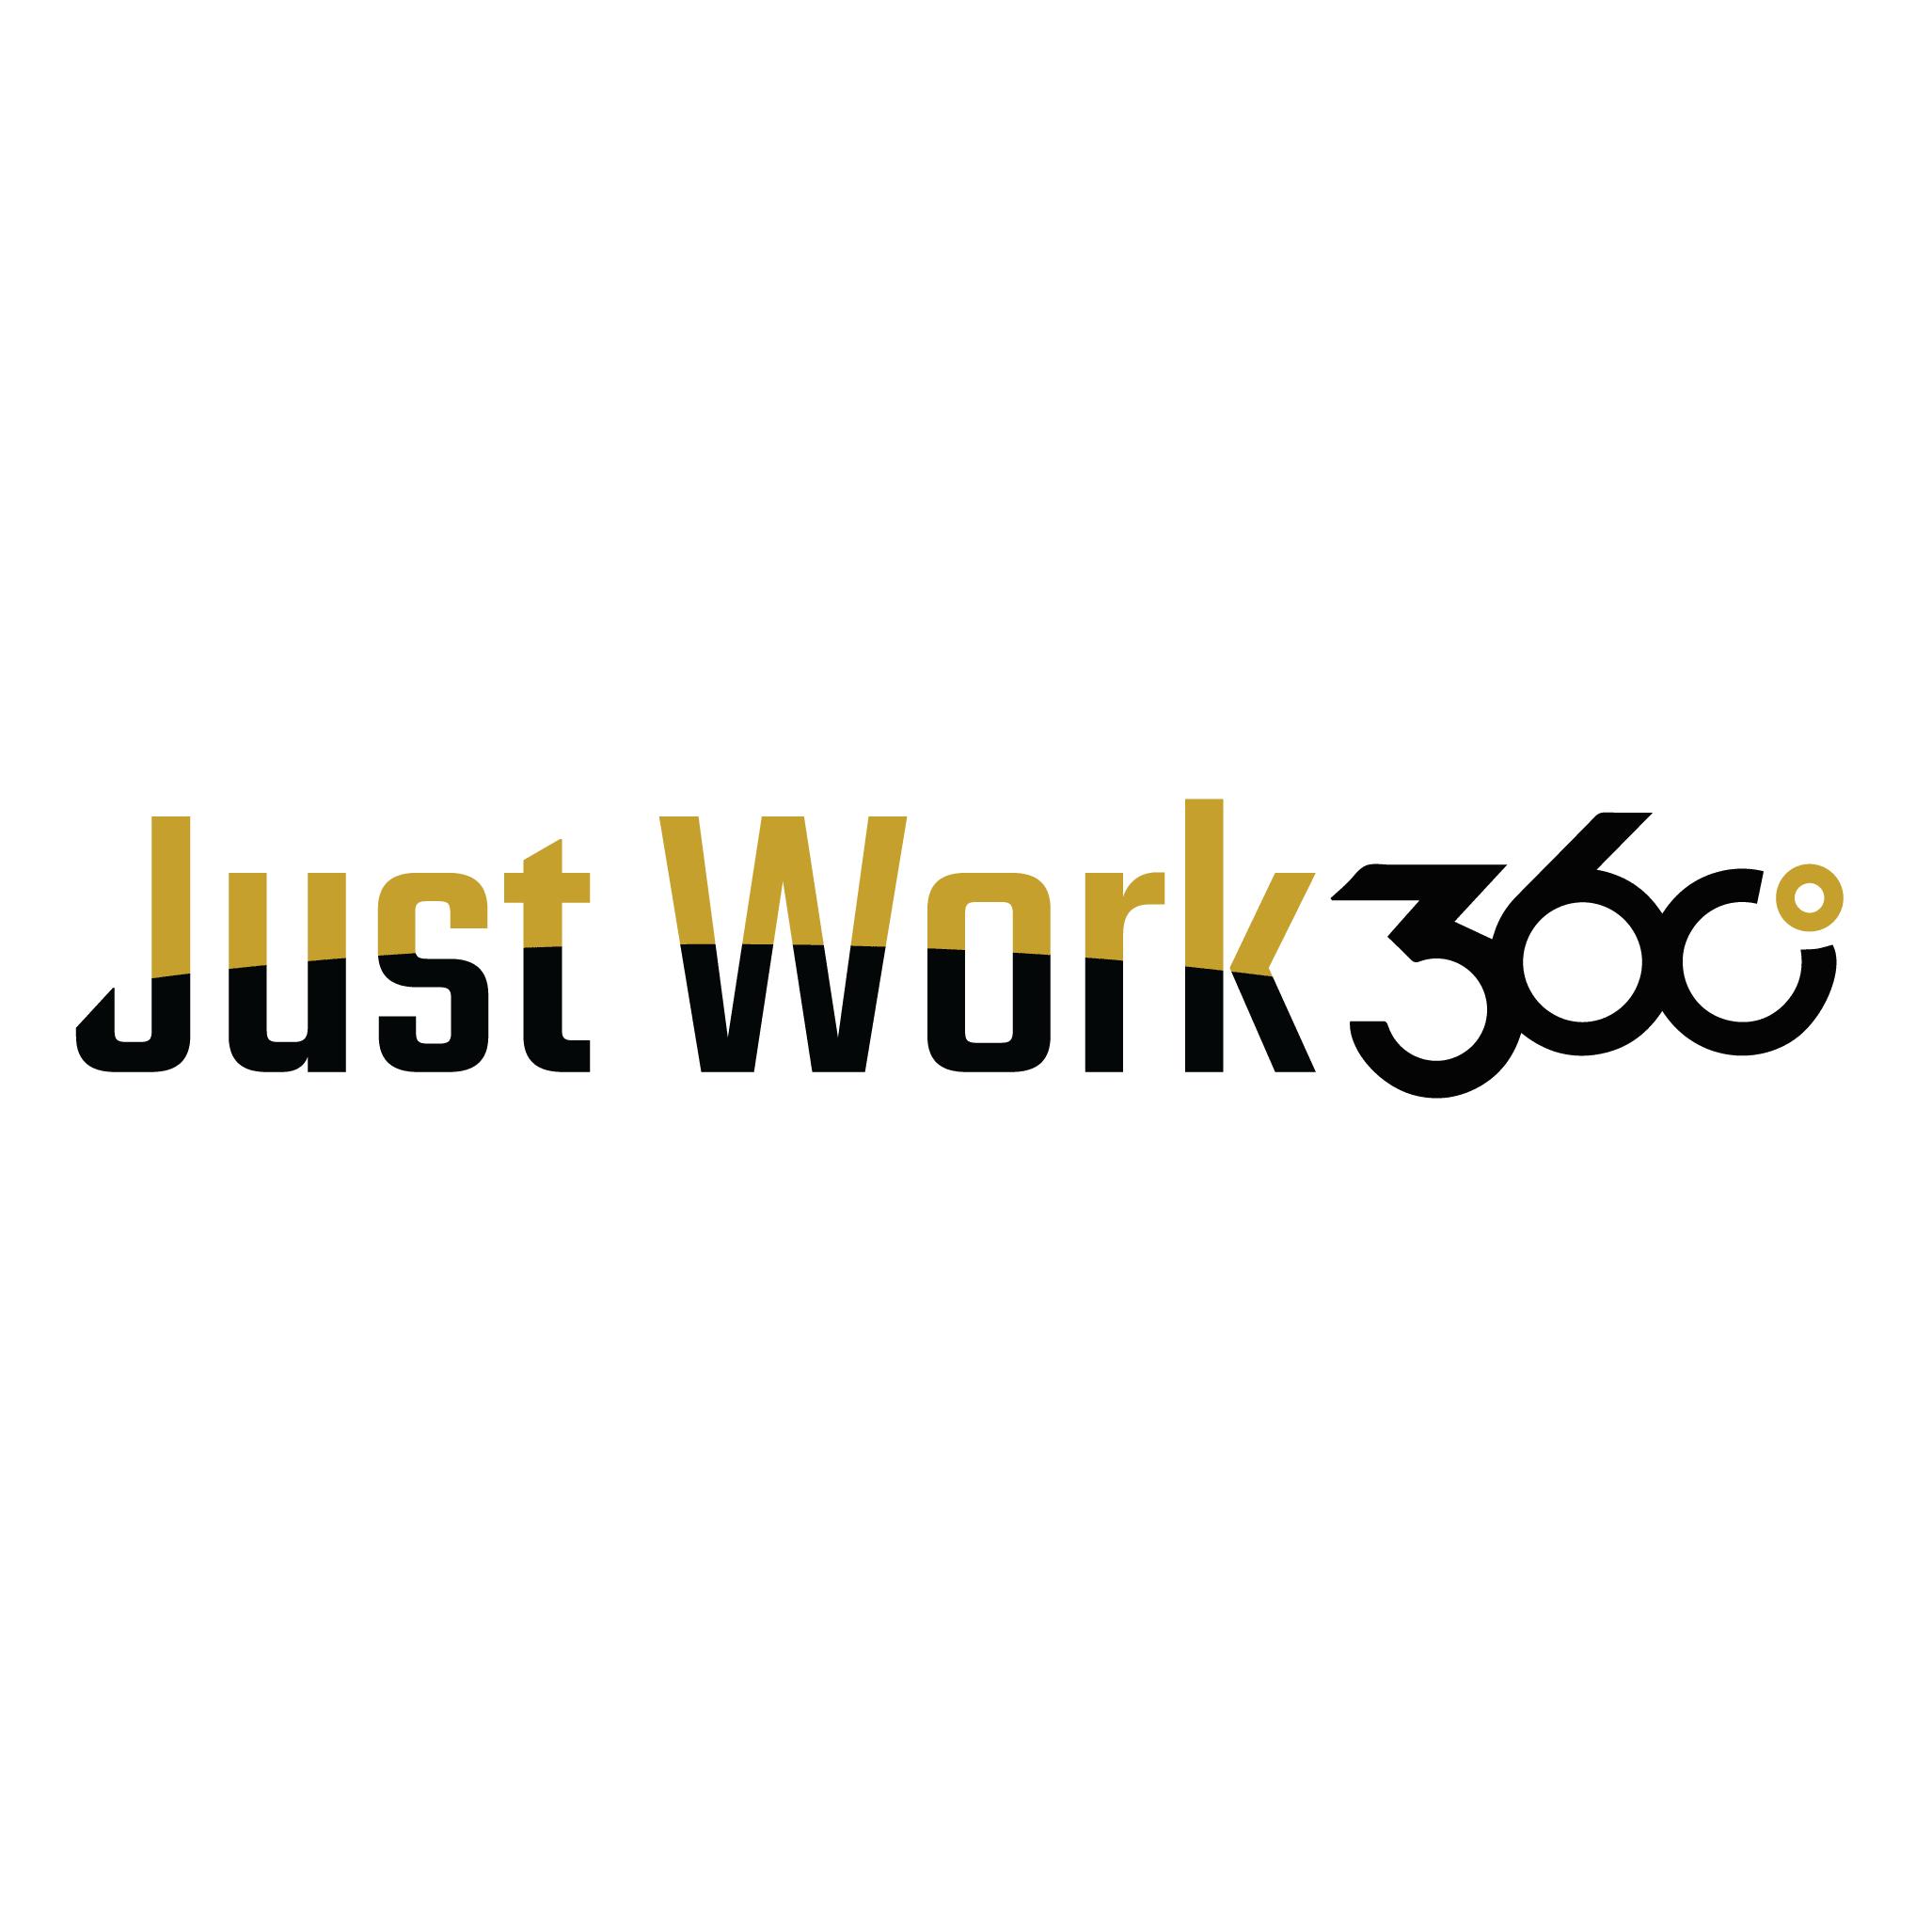 Just Work 360 - Mishawaka, IN - Business & Secretarial